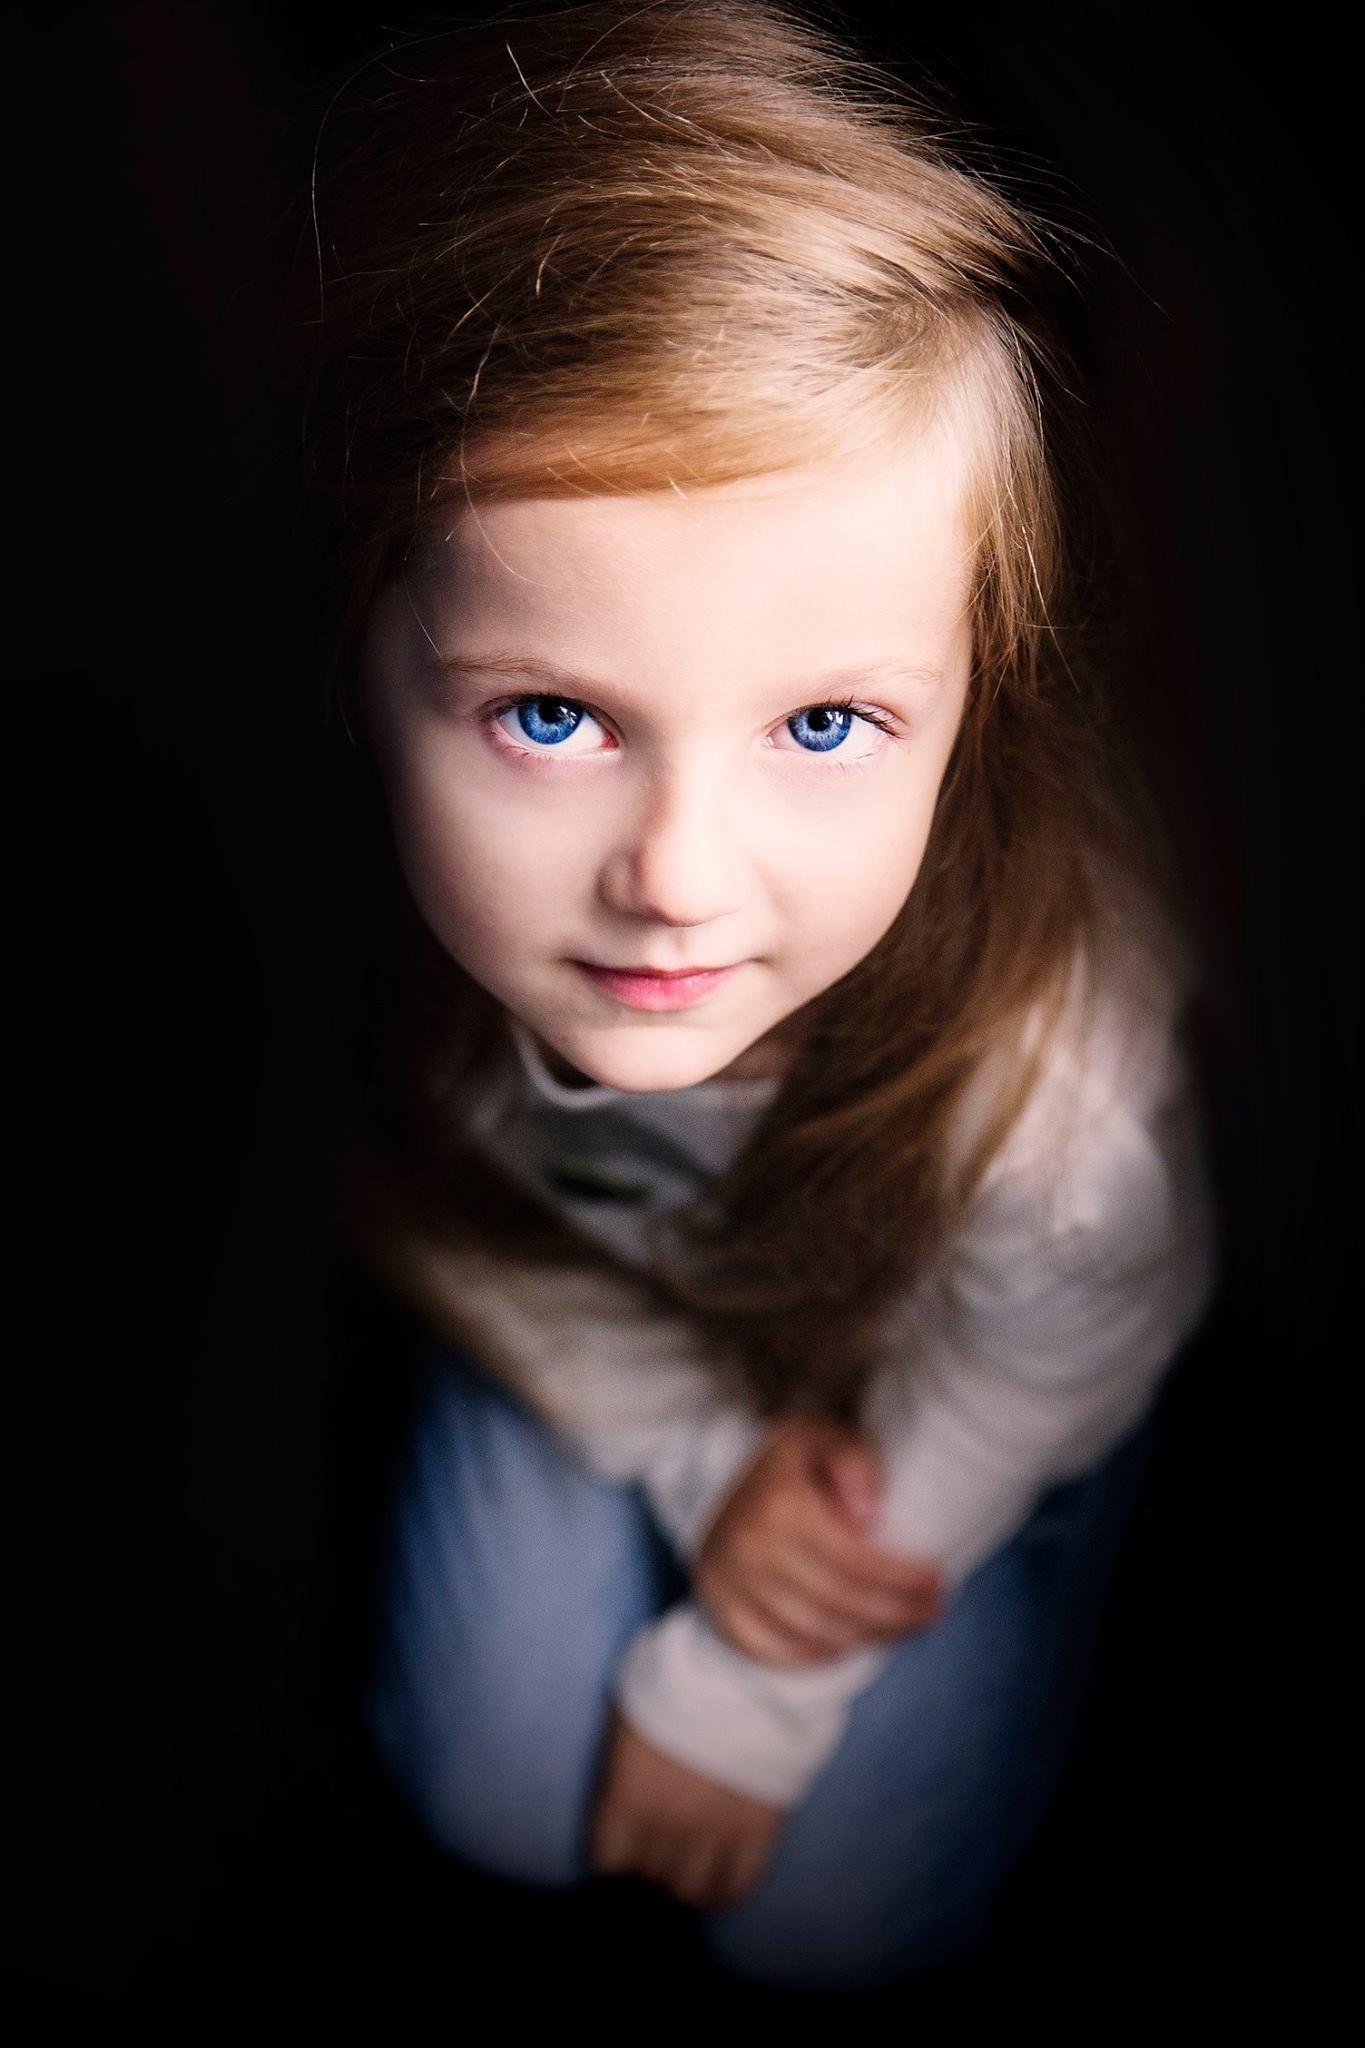 Face of an angel by sara.bond.353